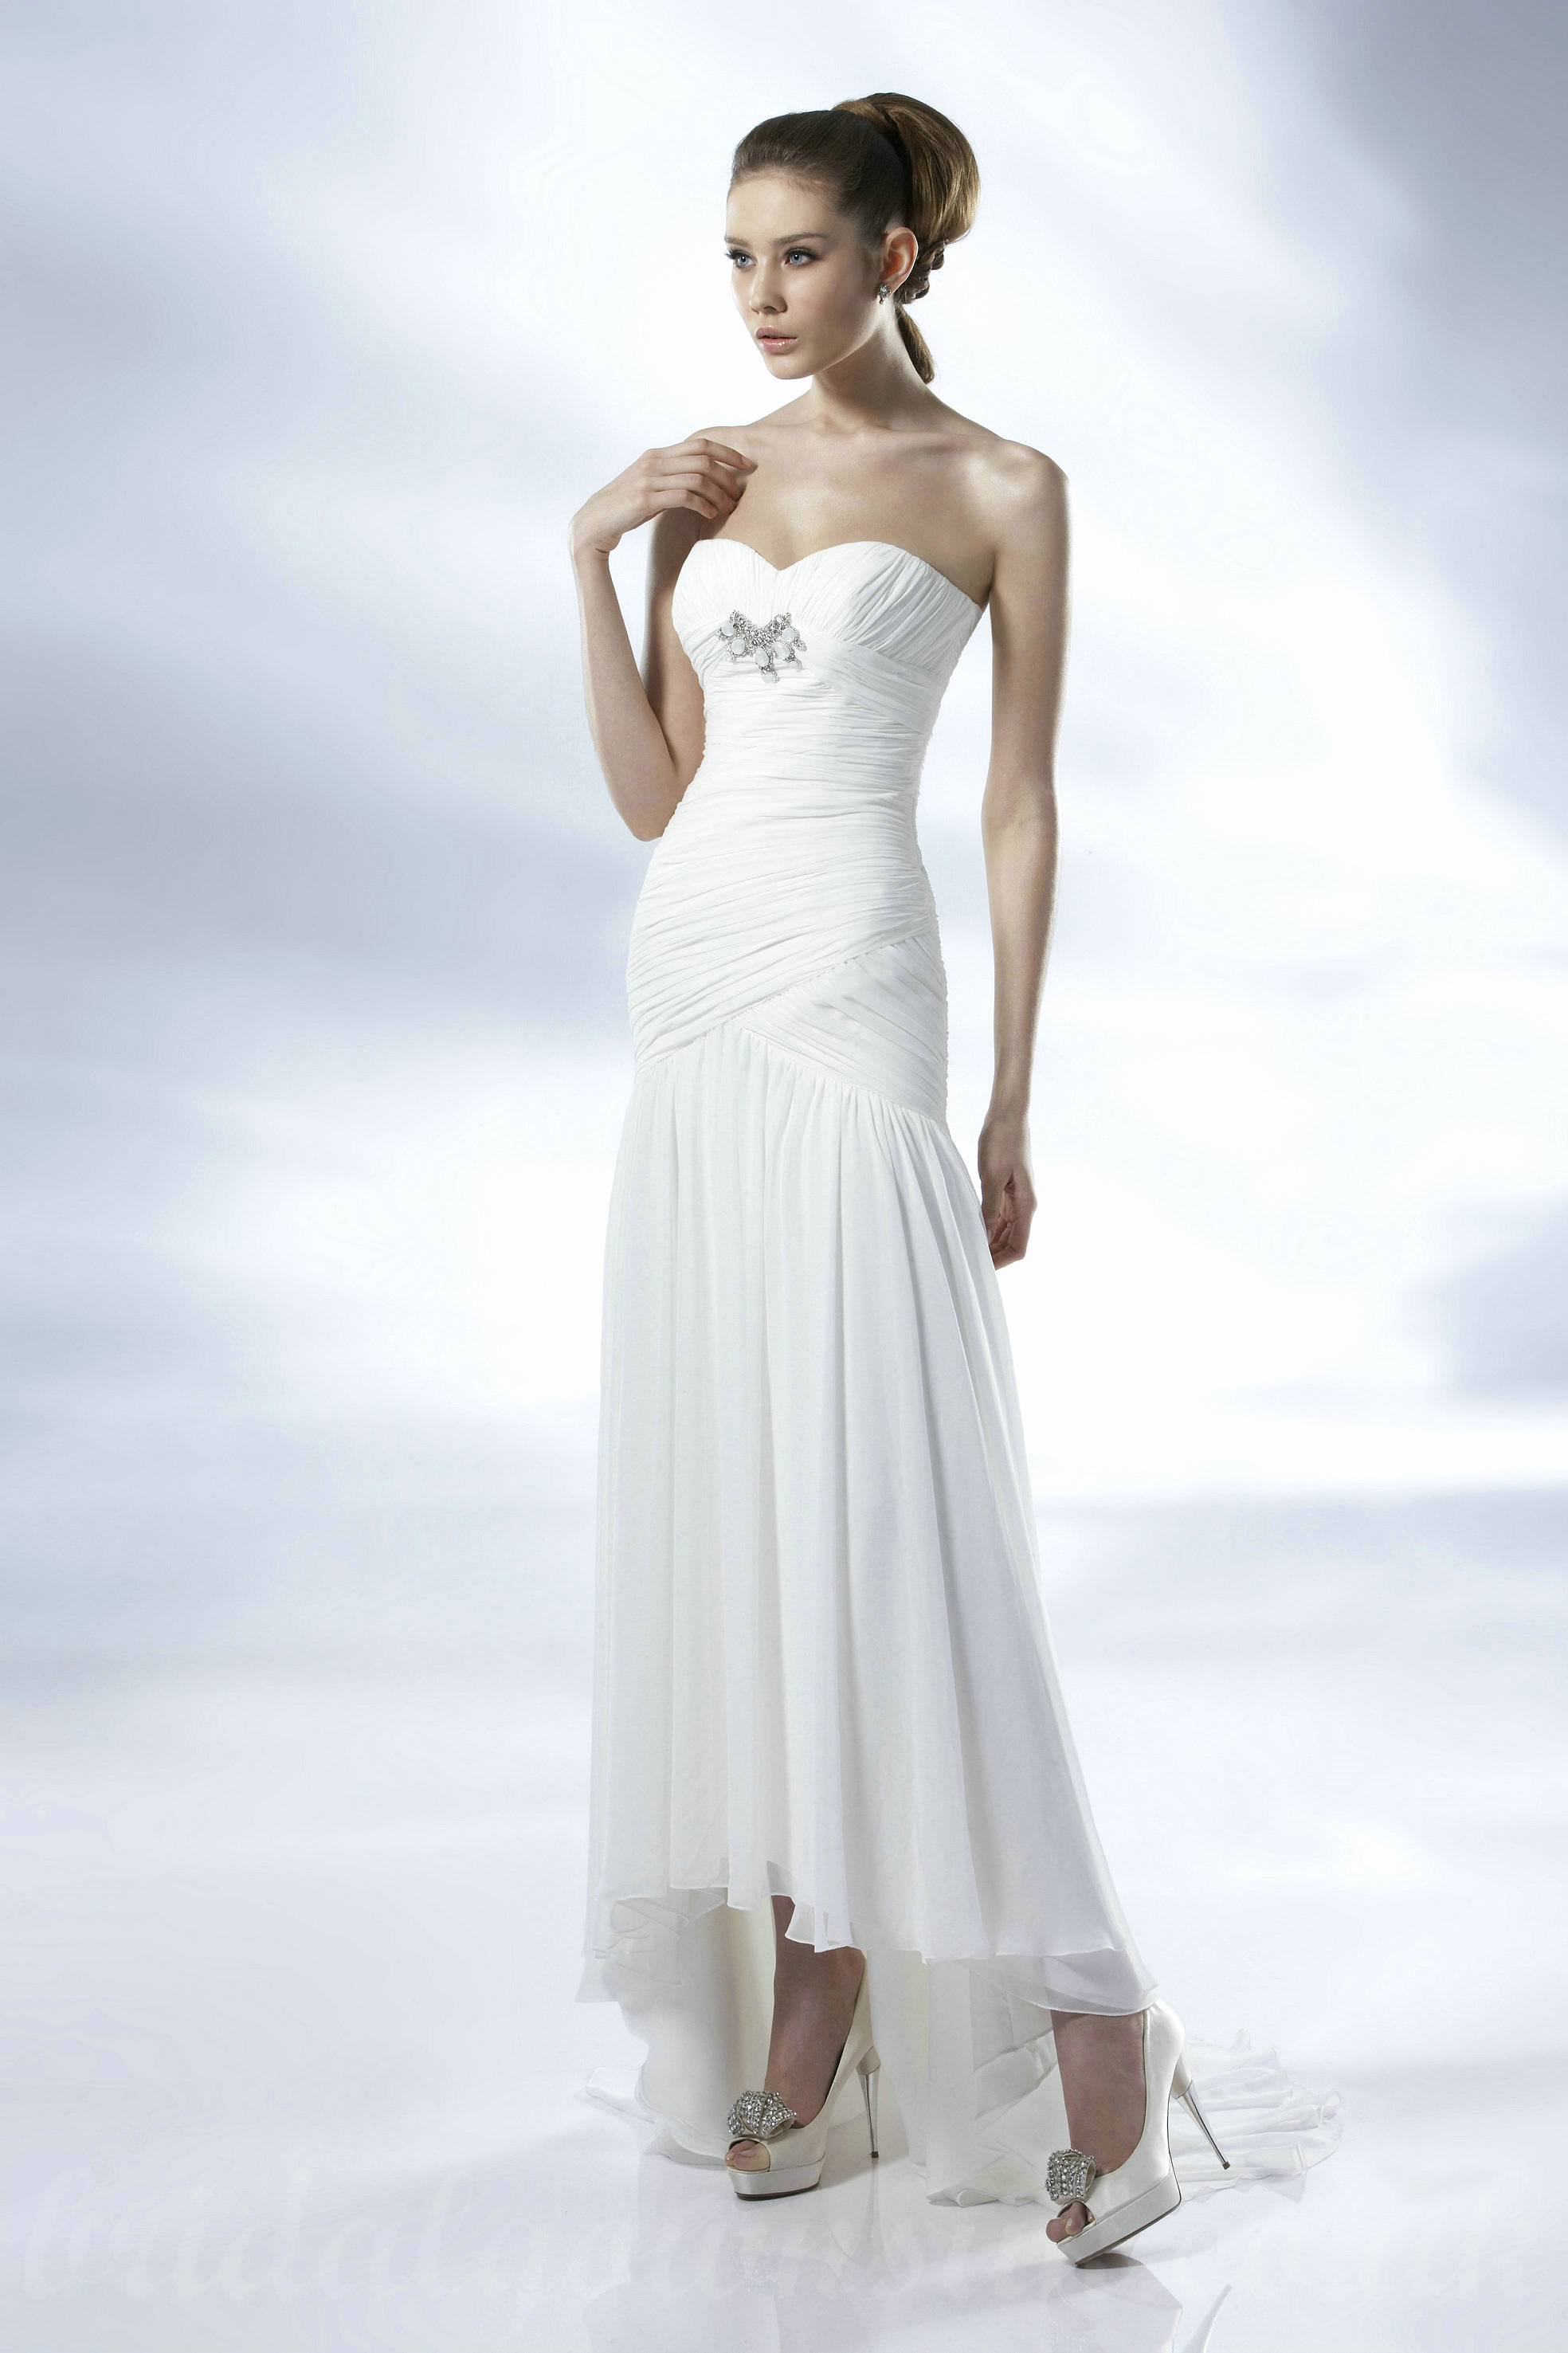 renting wedding dresses nyc photo - 1